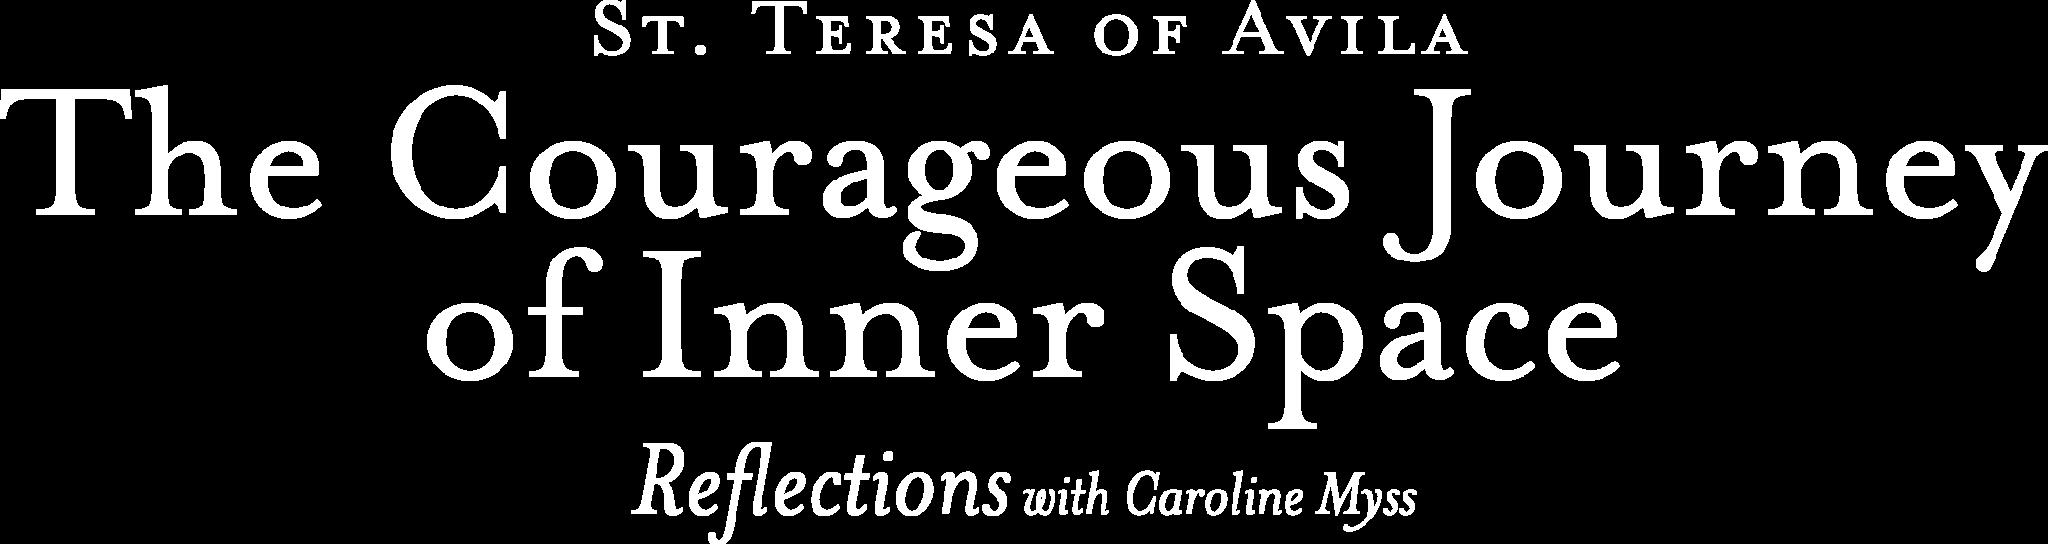 Reflections: Teresa of Avila - The Courageous Journey of Inner Space